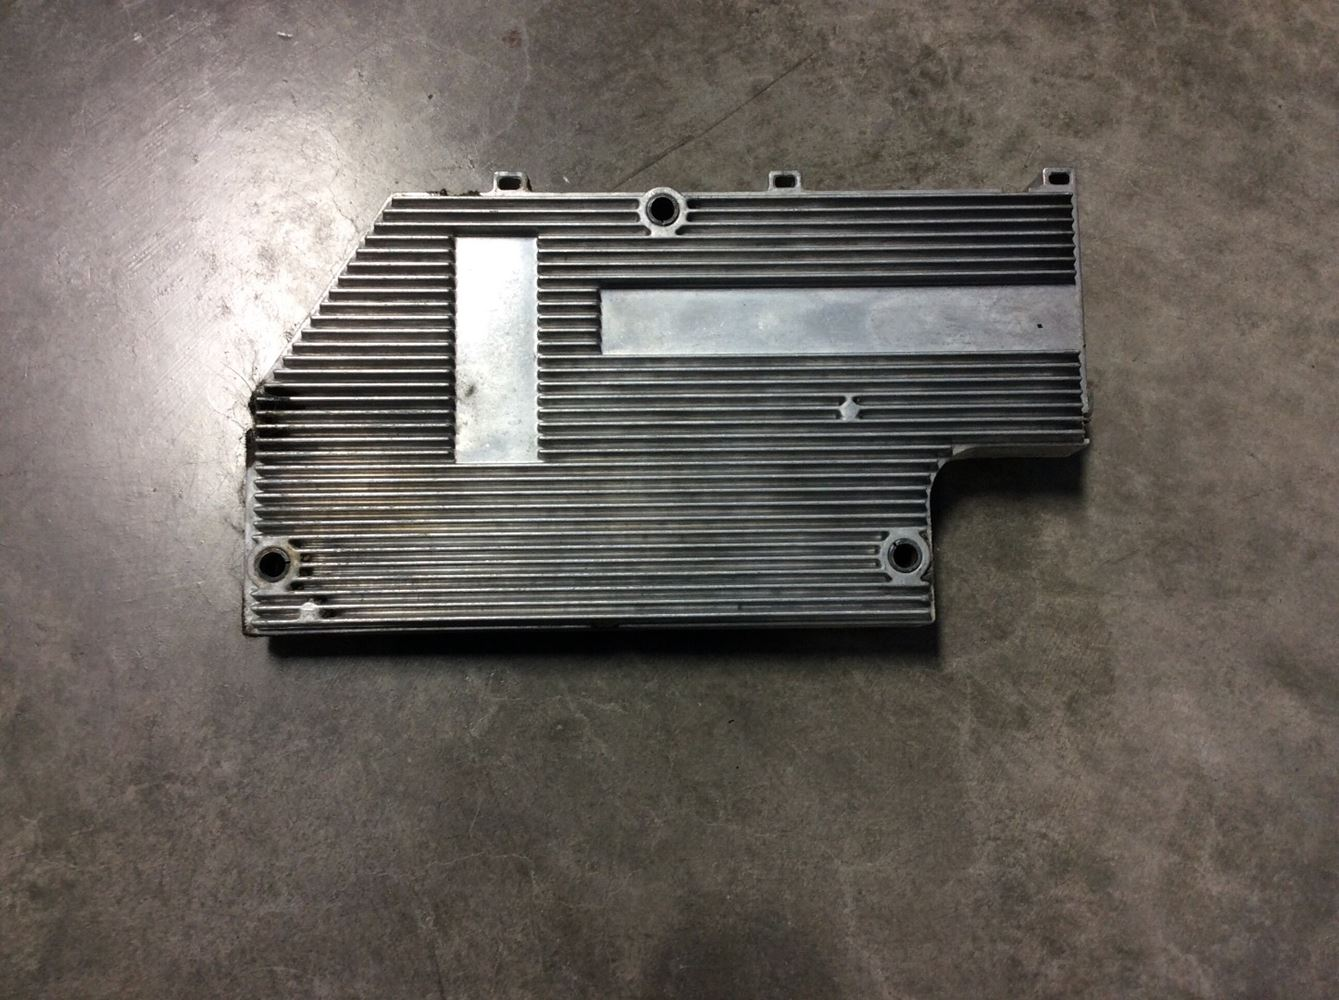 Interior Misc Parts Holst Truck 2012 Peterbilt 587 Fuse Box Image For